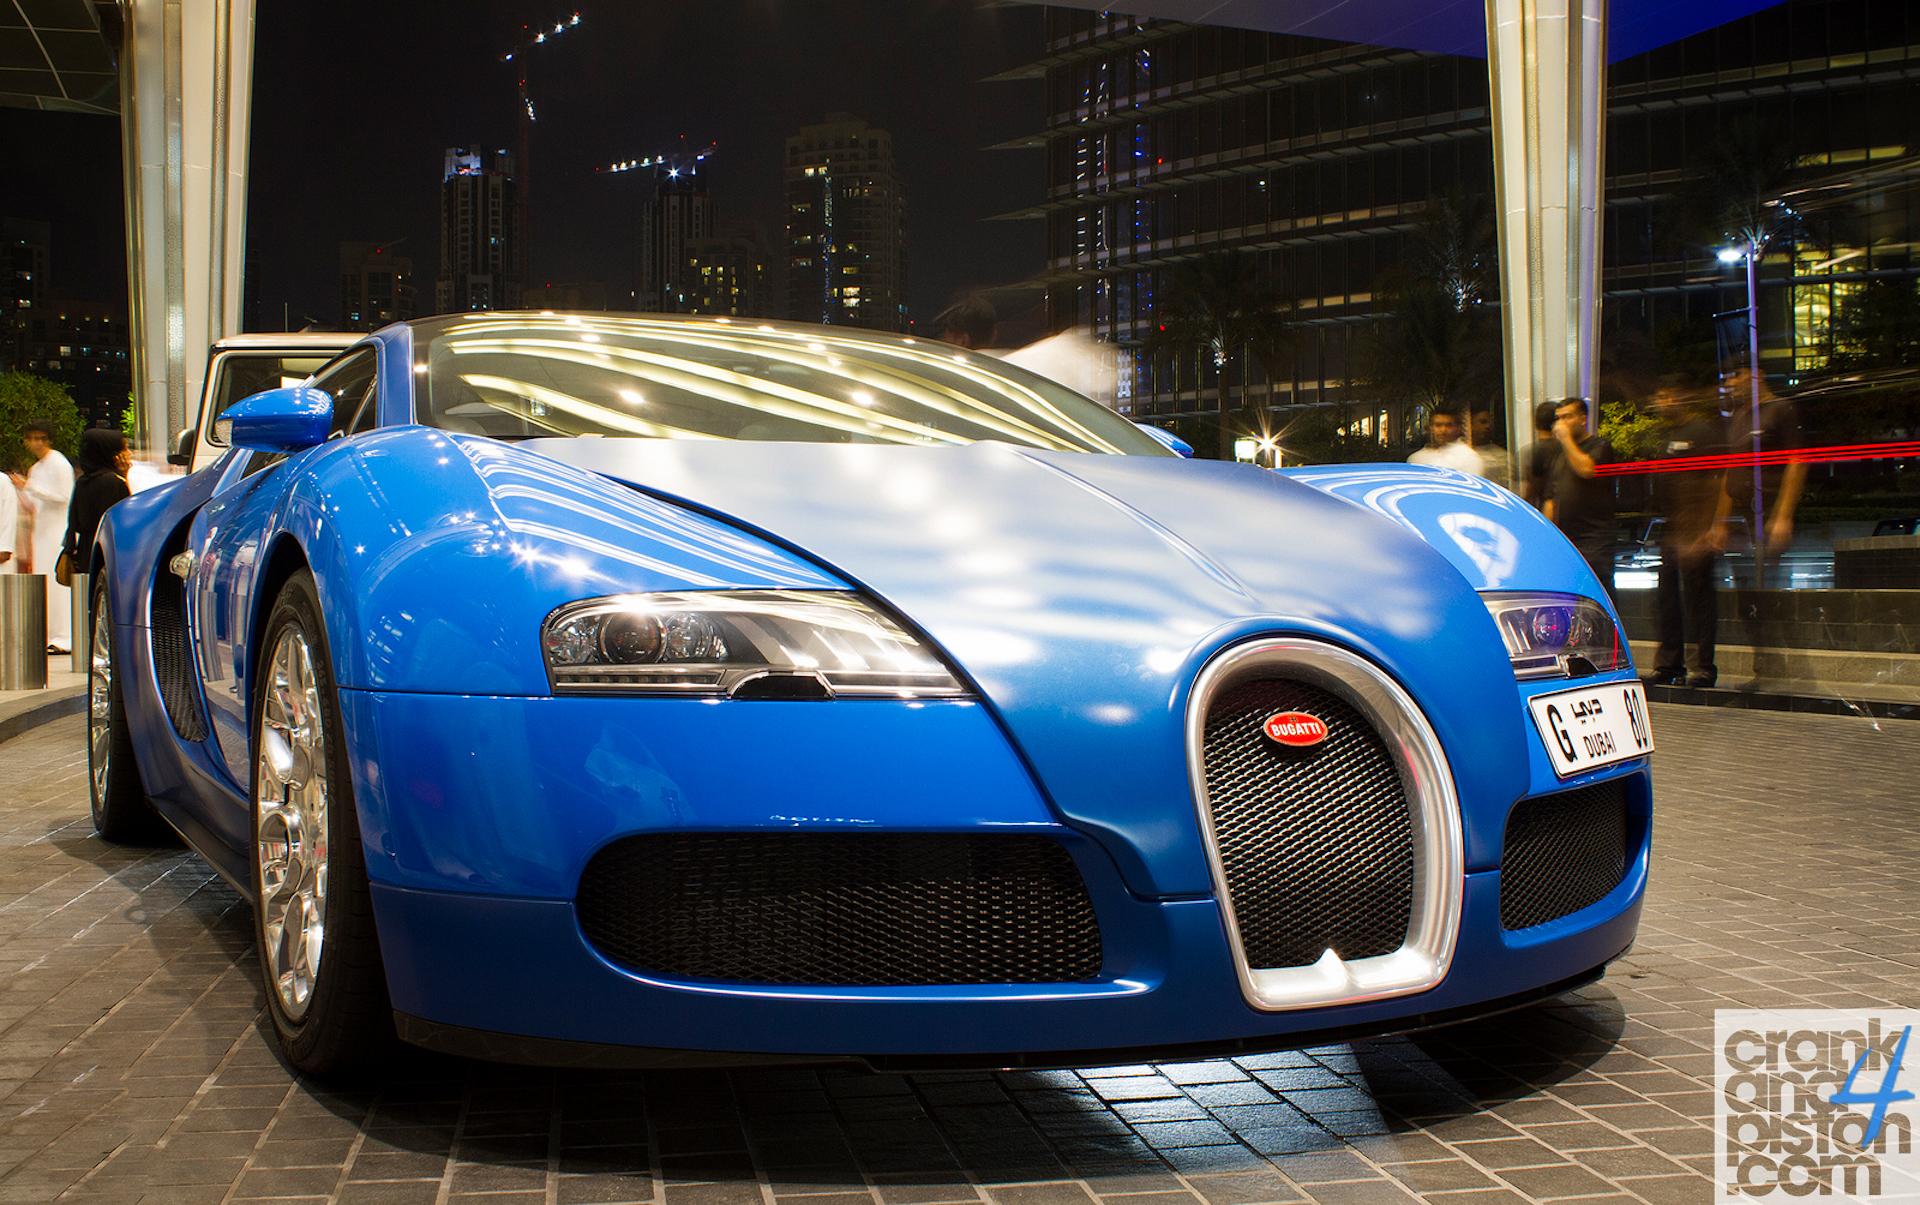 bugatti veyron grand sport dubai uae why so blue. Black Bedroom Furniture Sets. Home Design Ideas